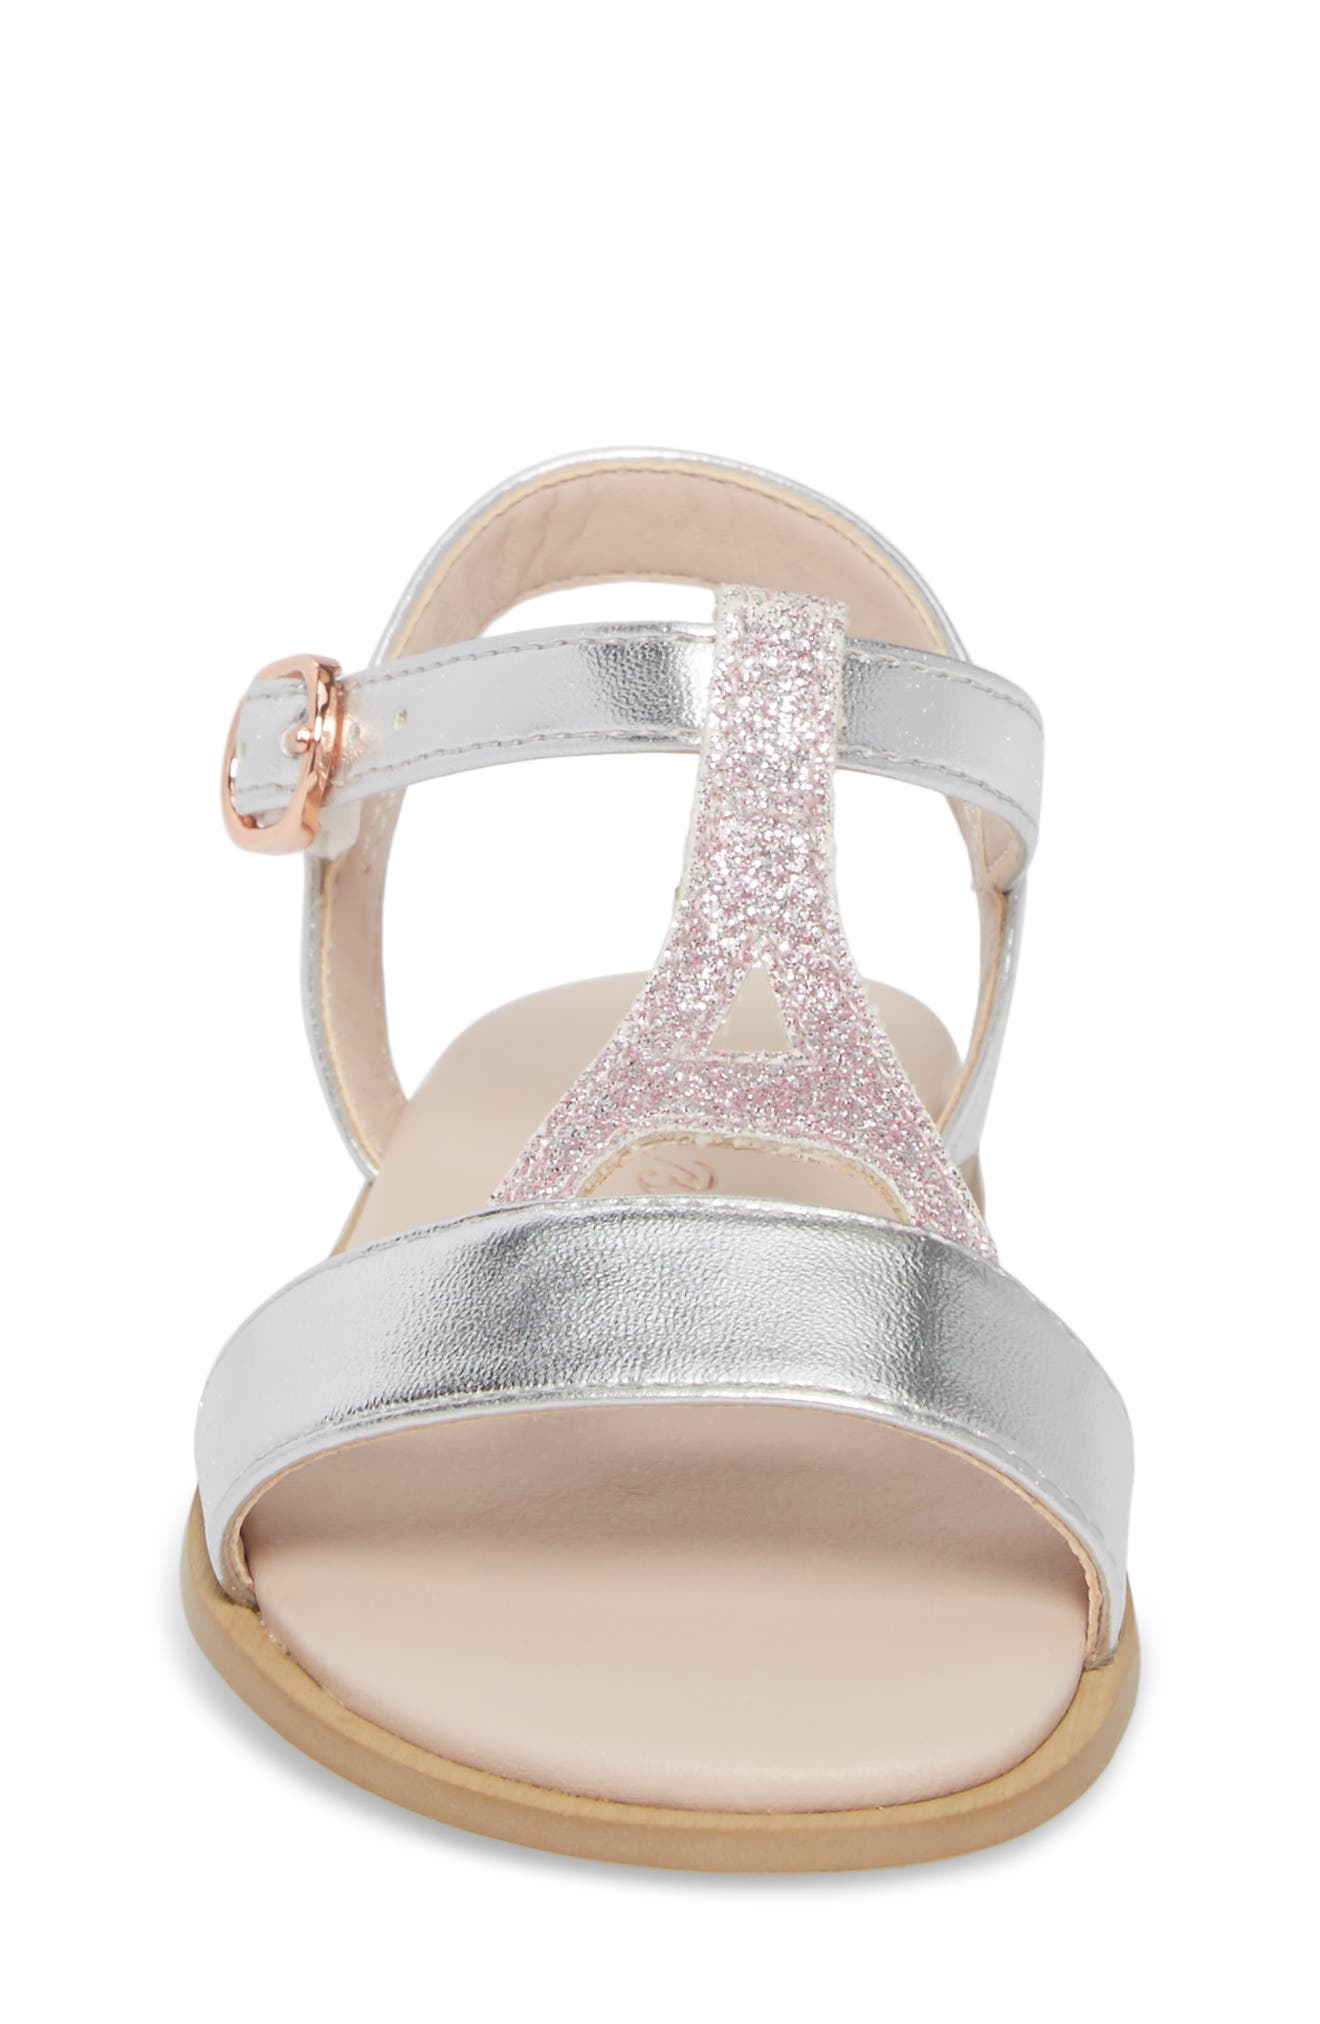 Tegan Glitter T-Strap Sandal,                             Alternate thumbnail 4, color,                             Silver Faux Leather